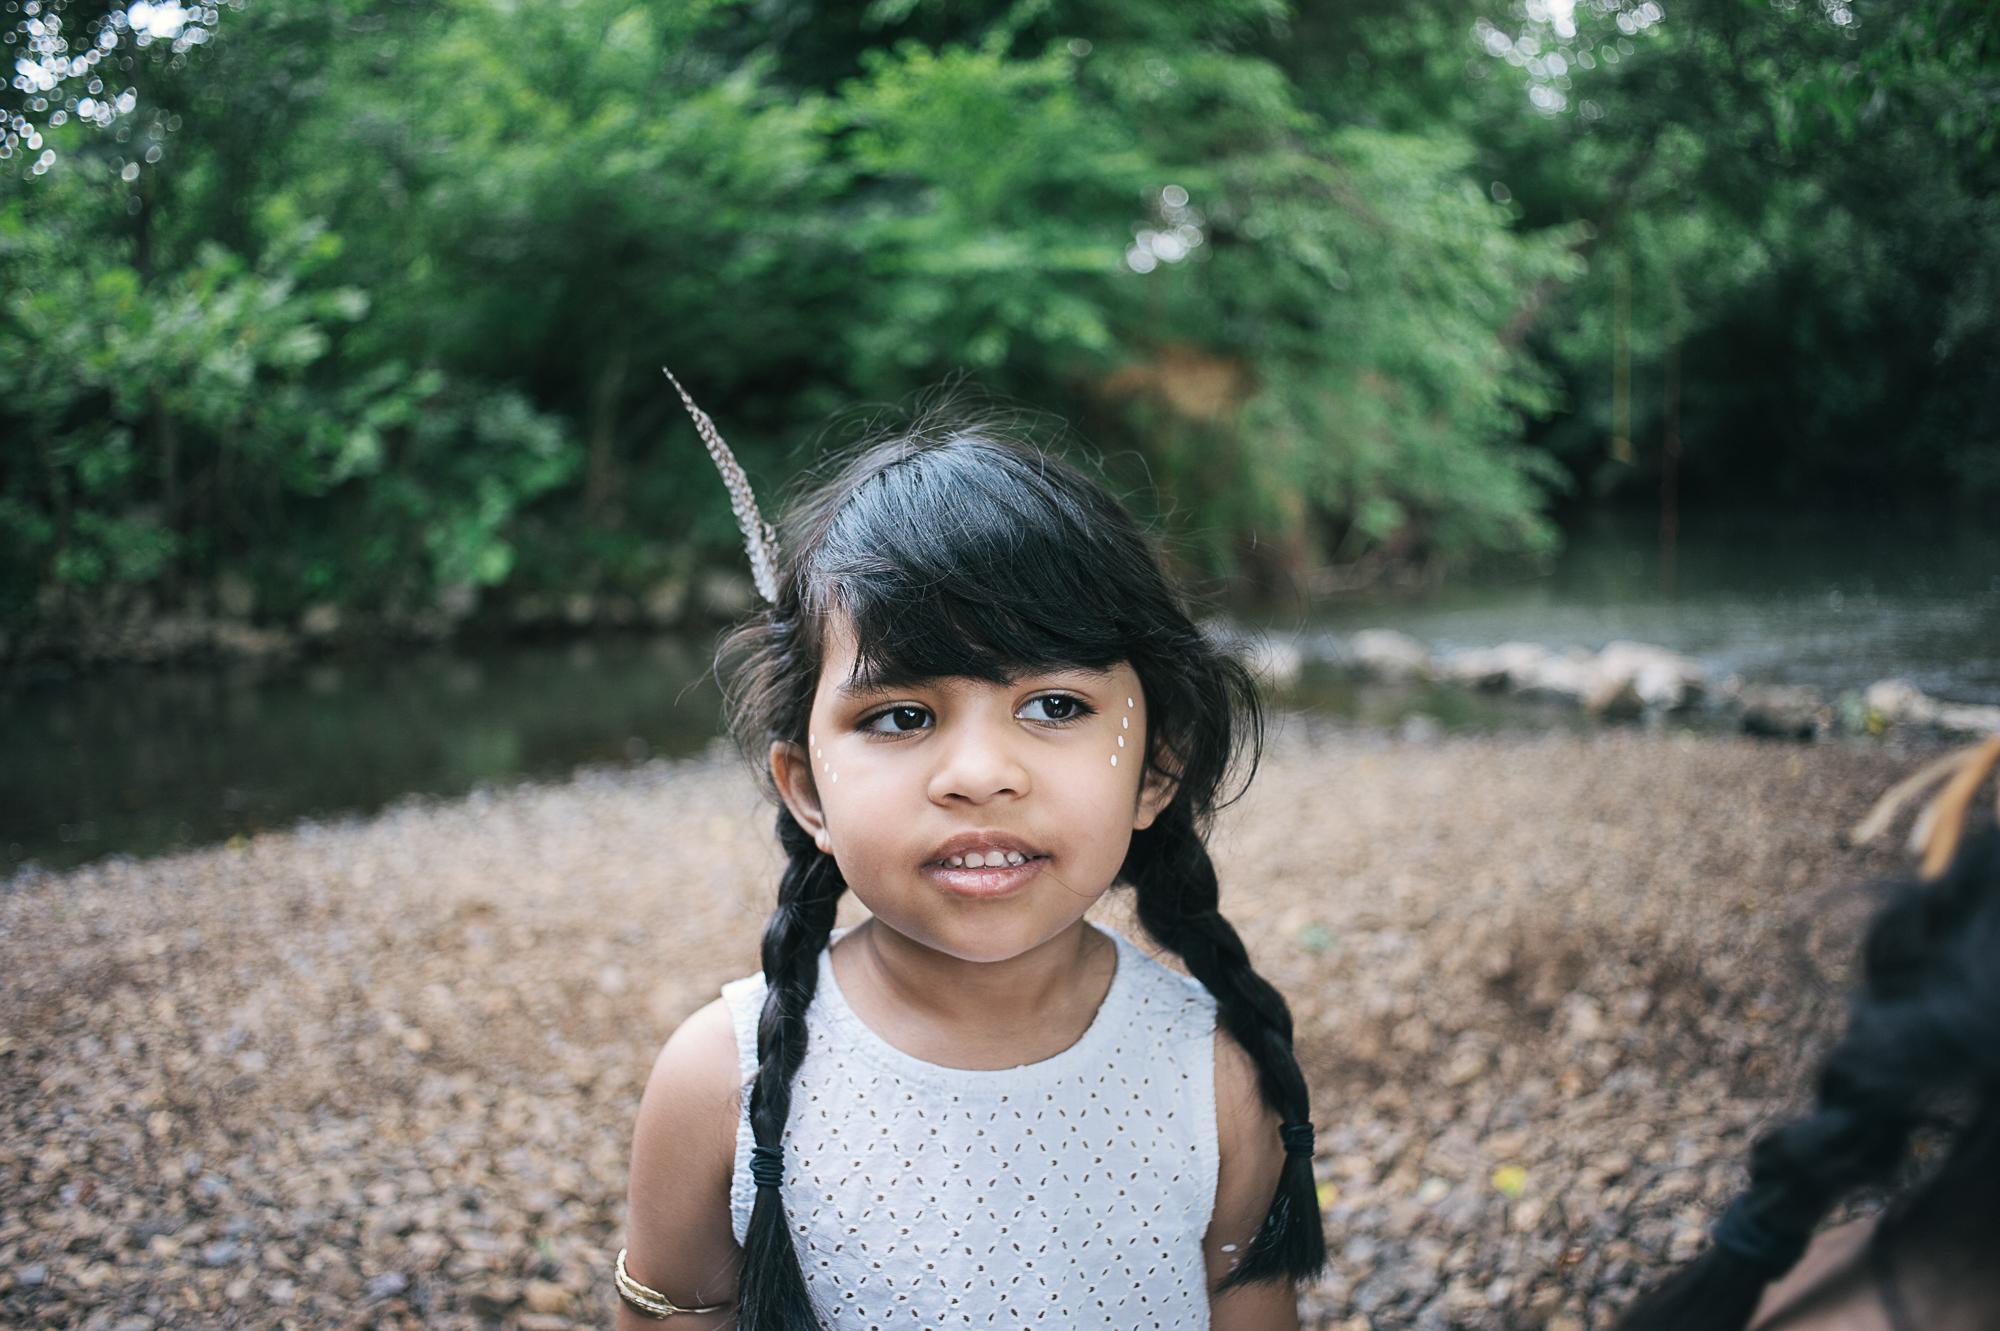 m.newsom-photography-savannah-senior-portrait-photographer-in-savannah-georgia (10 of 29).jpg